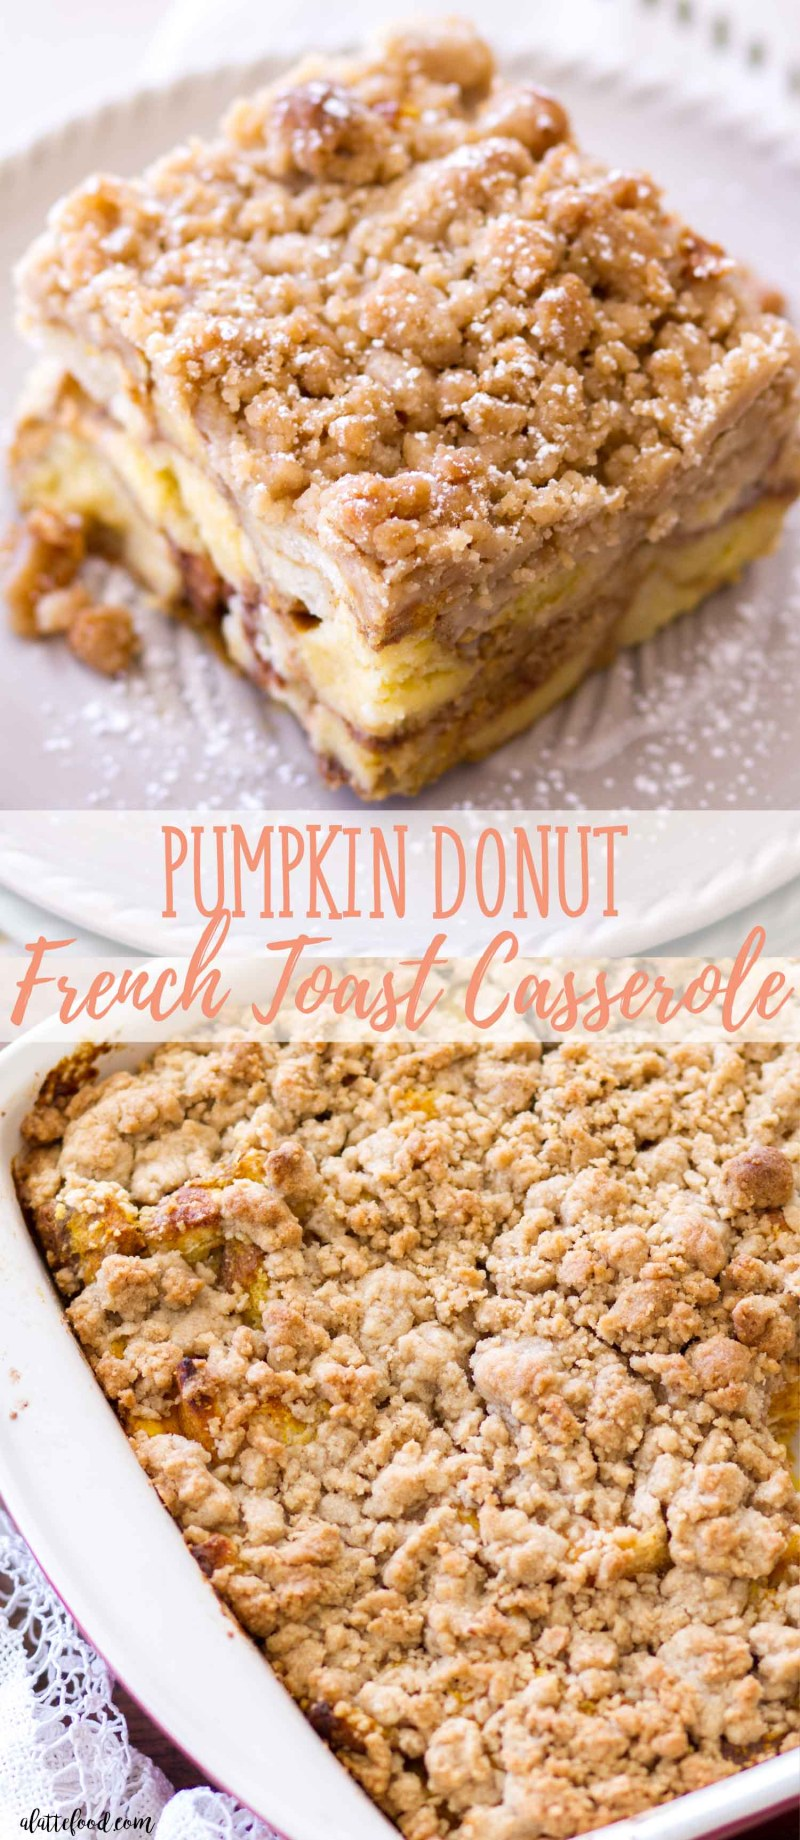 pumpkin donut french toast casserole collage photo